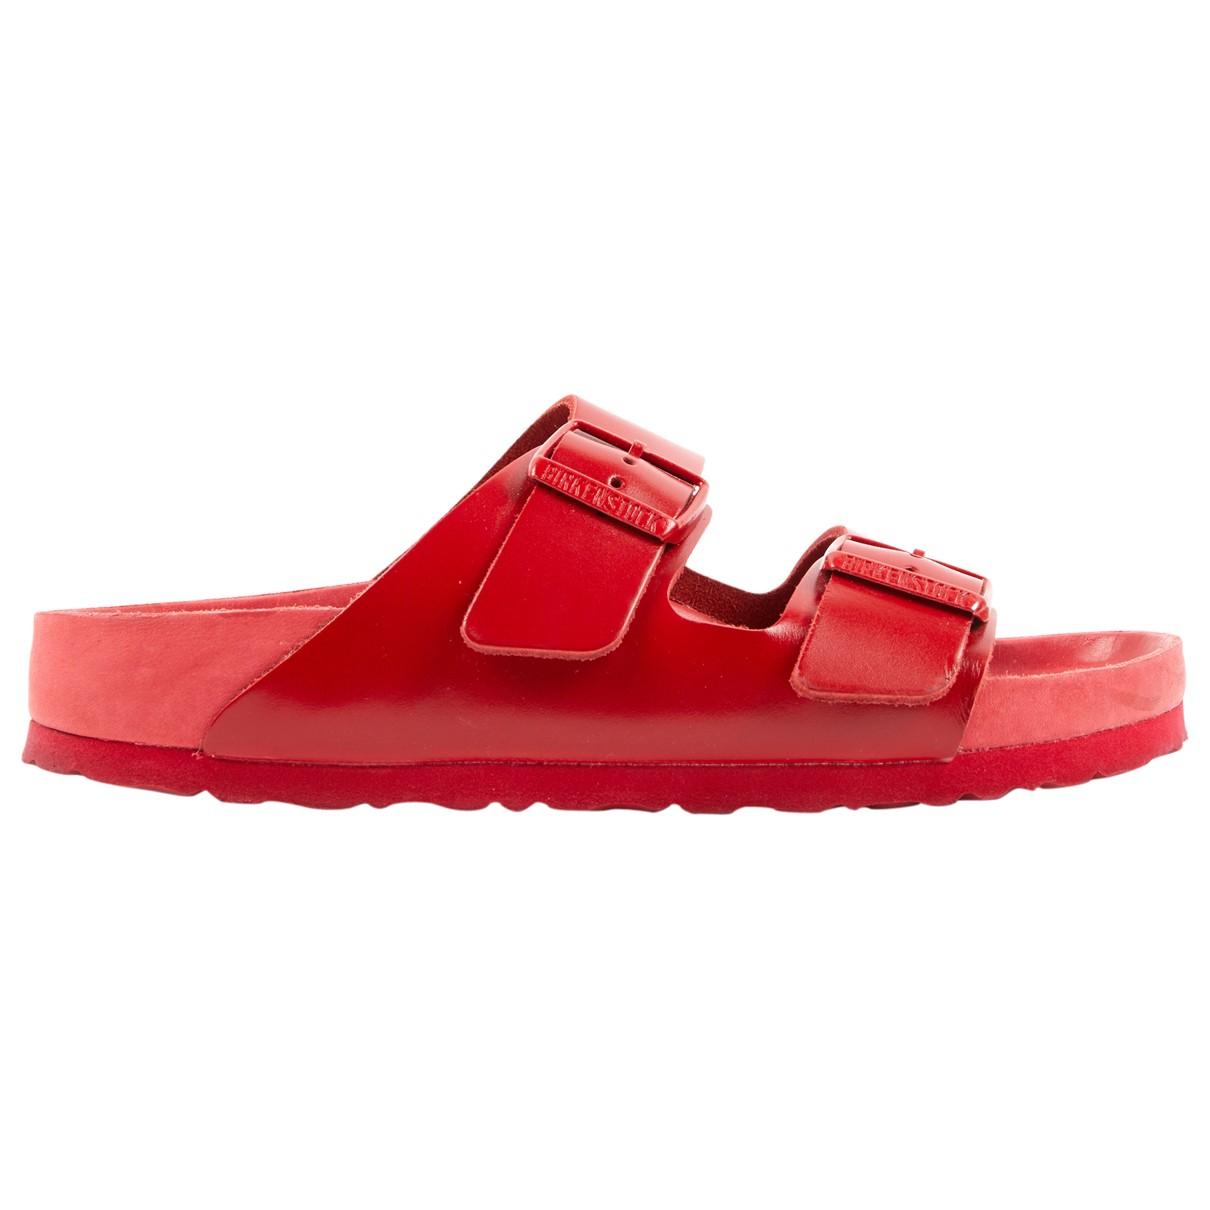 Valentino Garavani \N Red Leather Sandals for Women 38 EU